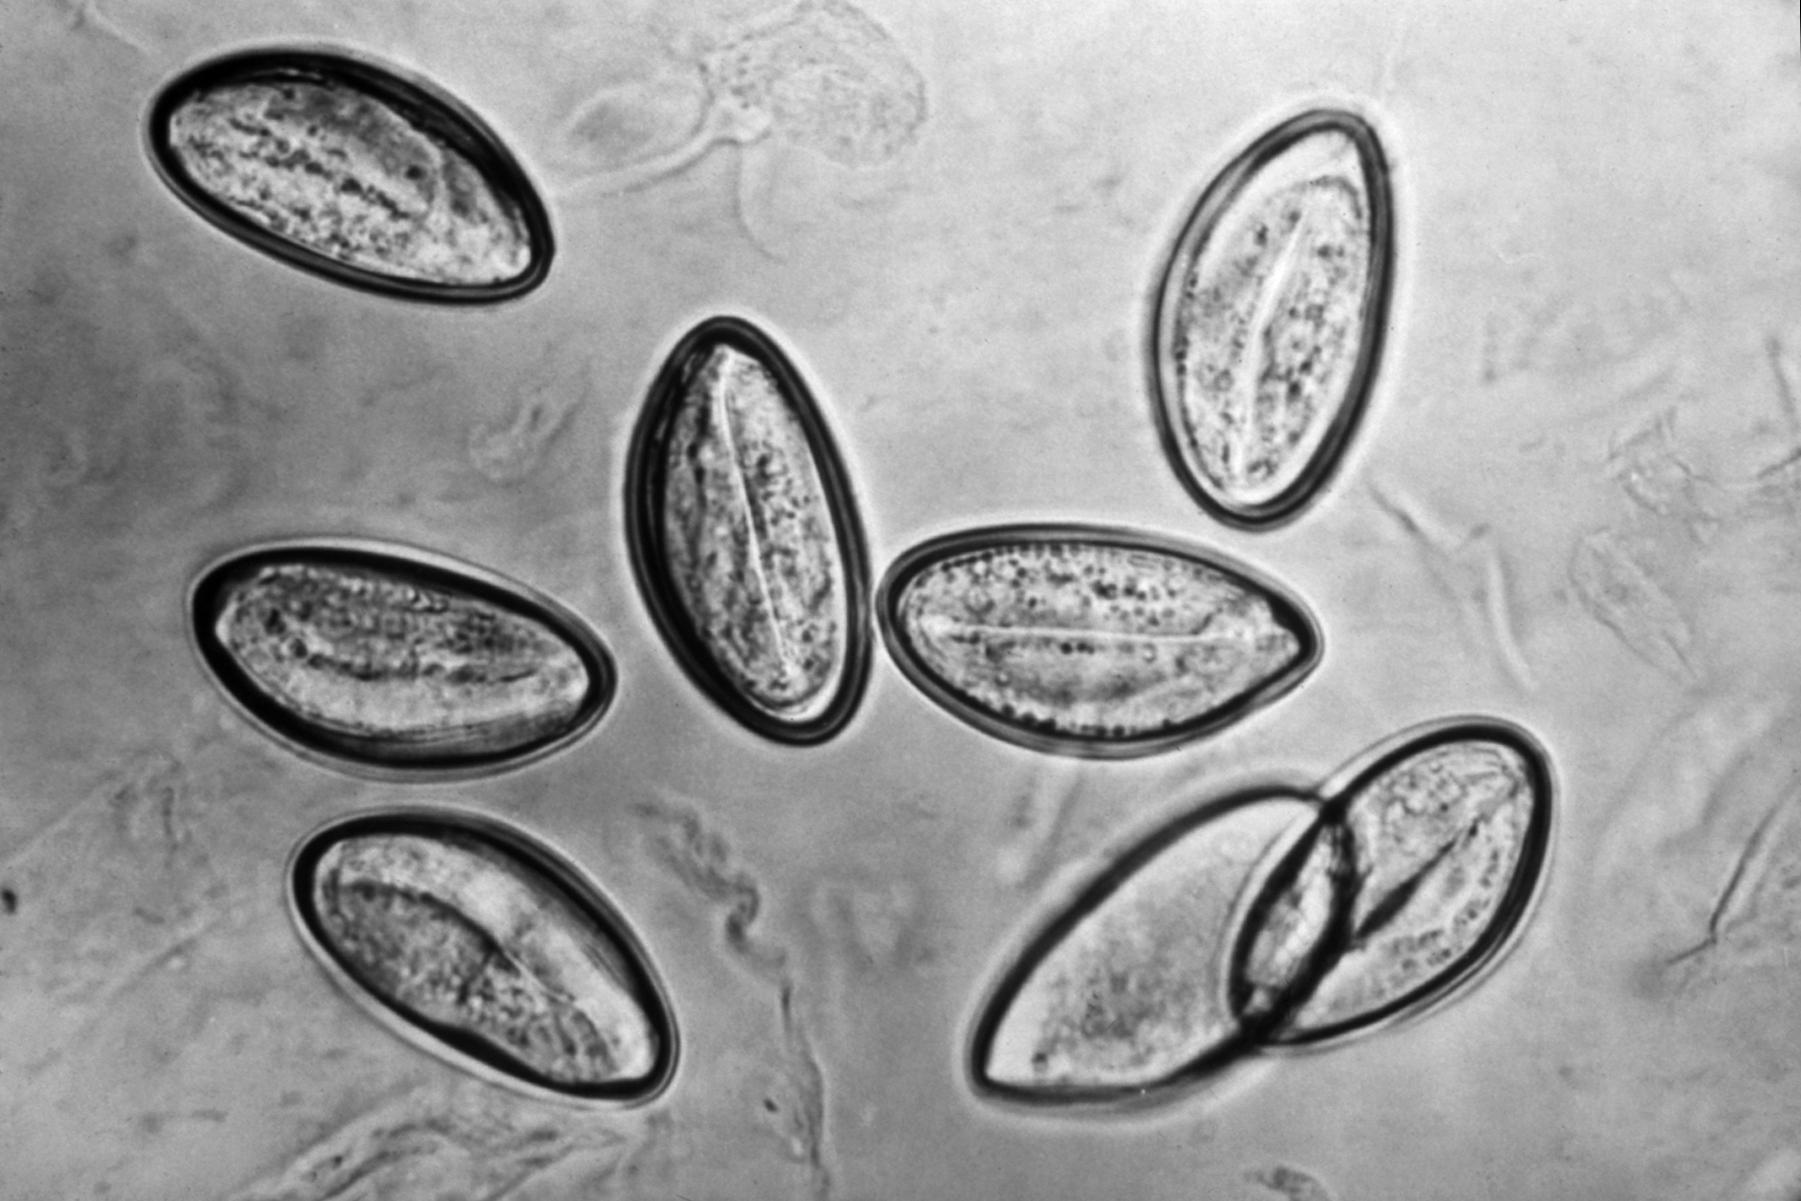 Enterobius vermicularis historia - Enterobius vermicularis taxonomy, Cargado por